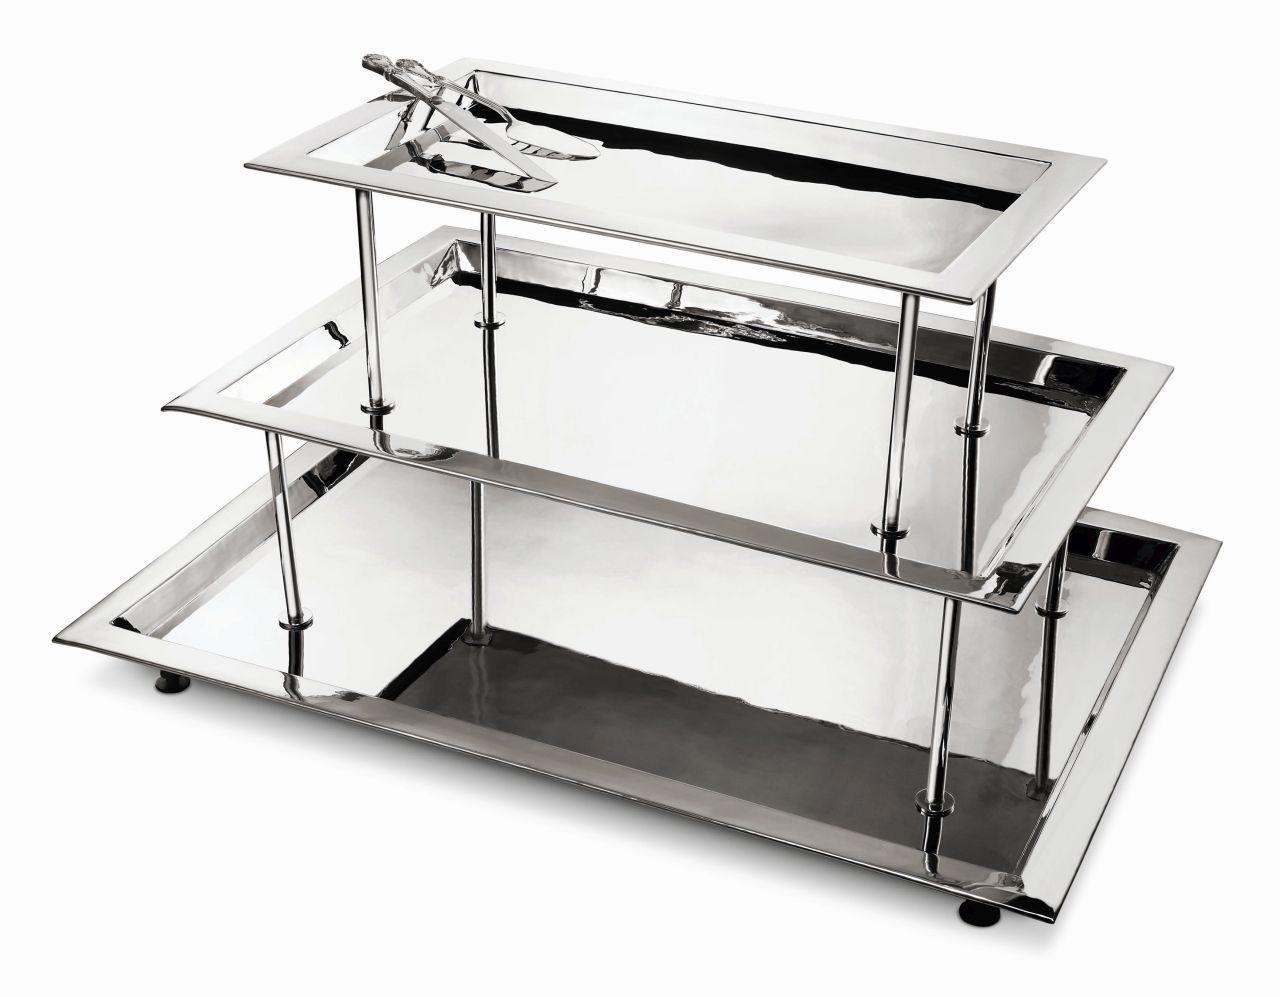 Vassoio rettangolare tre piani buffet stile Cardinale argentato argento sheffield cm.101x70x54h